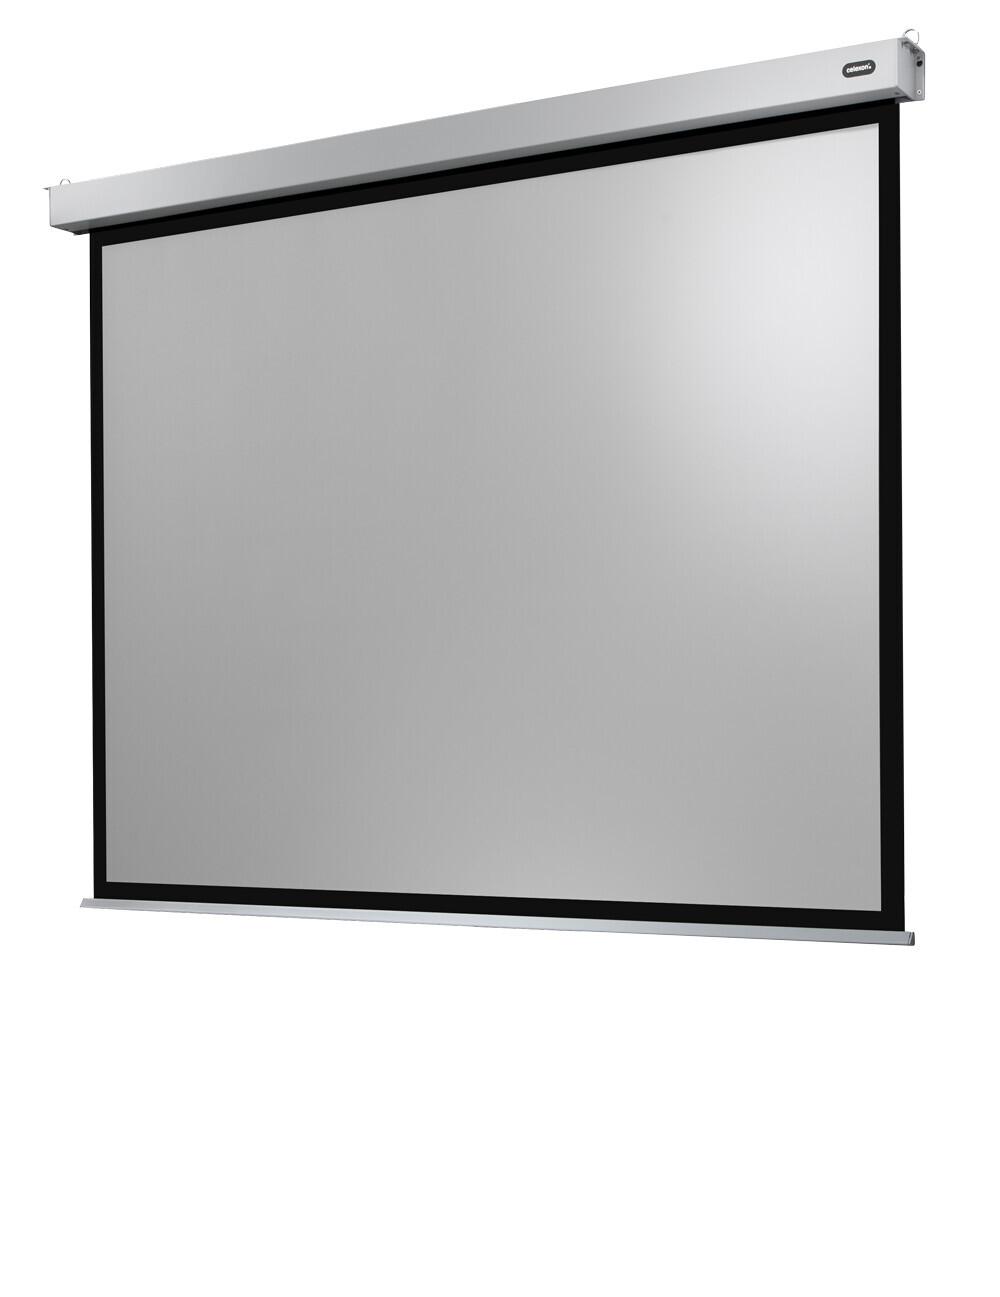 Celexon Electric Professional Plus Screen 300 x 225 cm